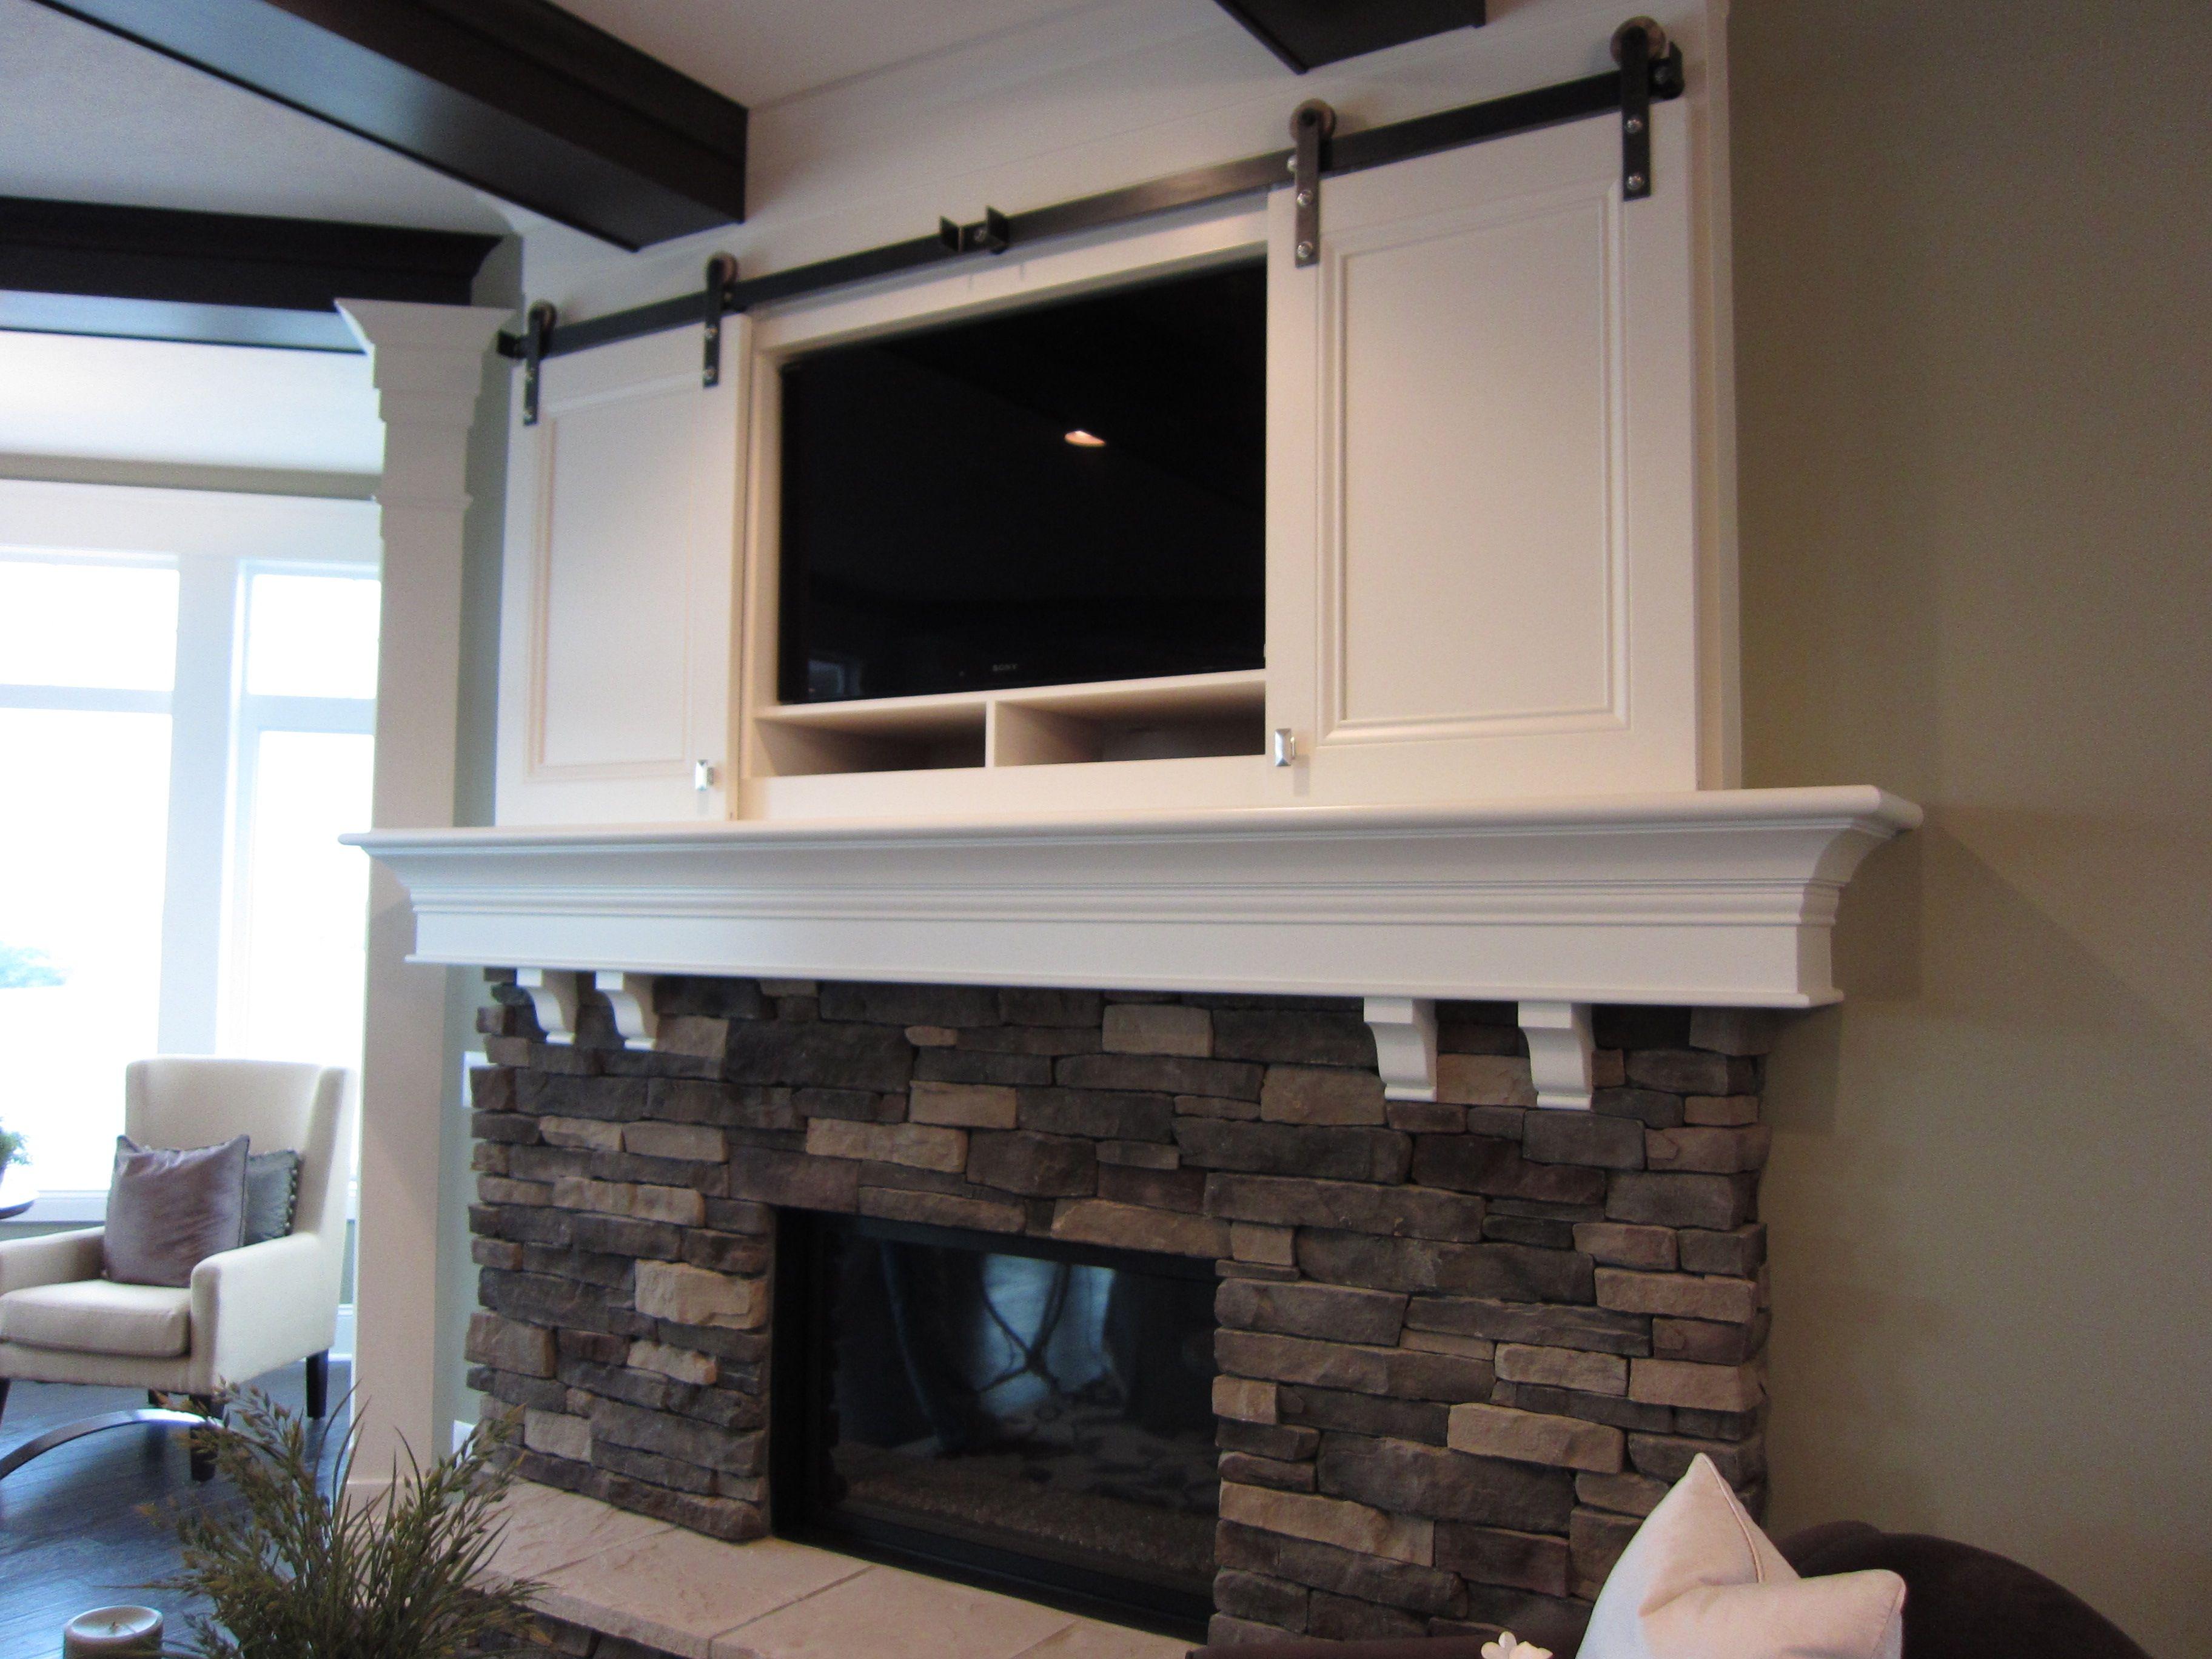 Over Fireplace Ideas New Fireplace Tv Mantel Ideas Best 25 Tv Above Fireplace Ideas